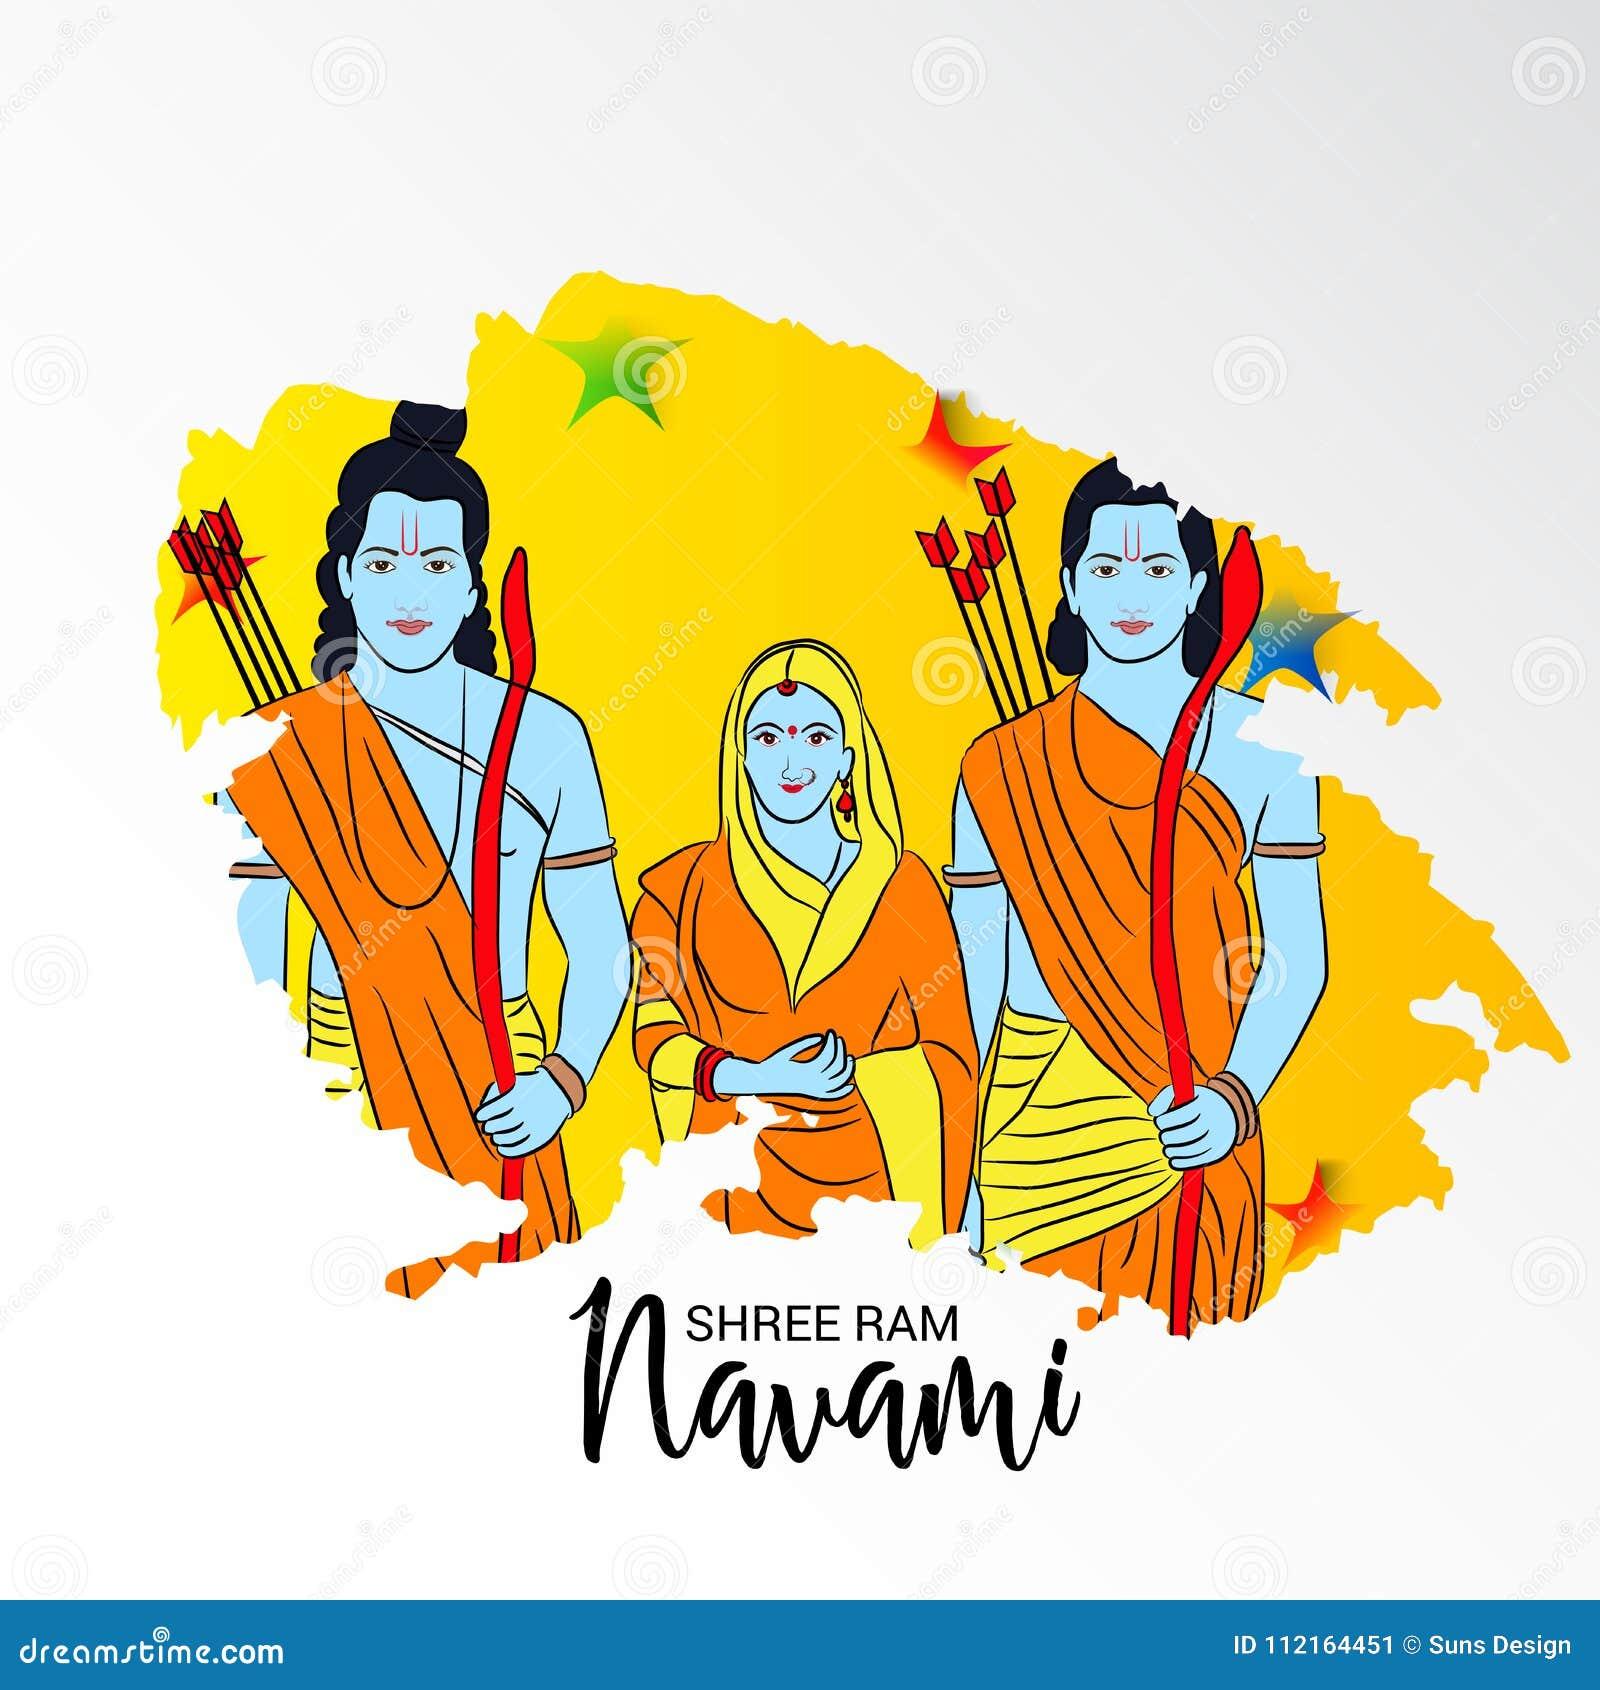 ᐈ Sri rama stock images, Royalty Free shri ram   download on Depositphotos®